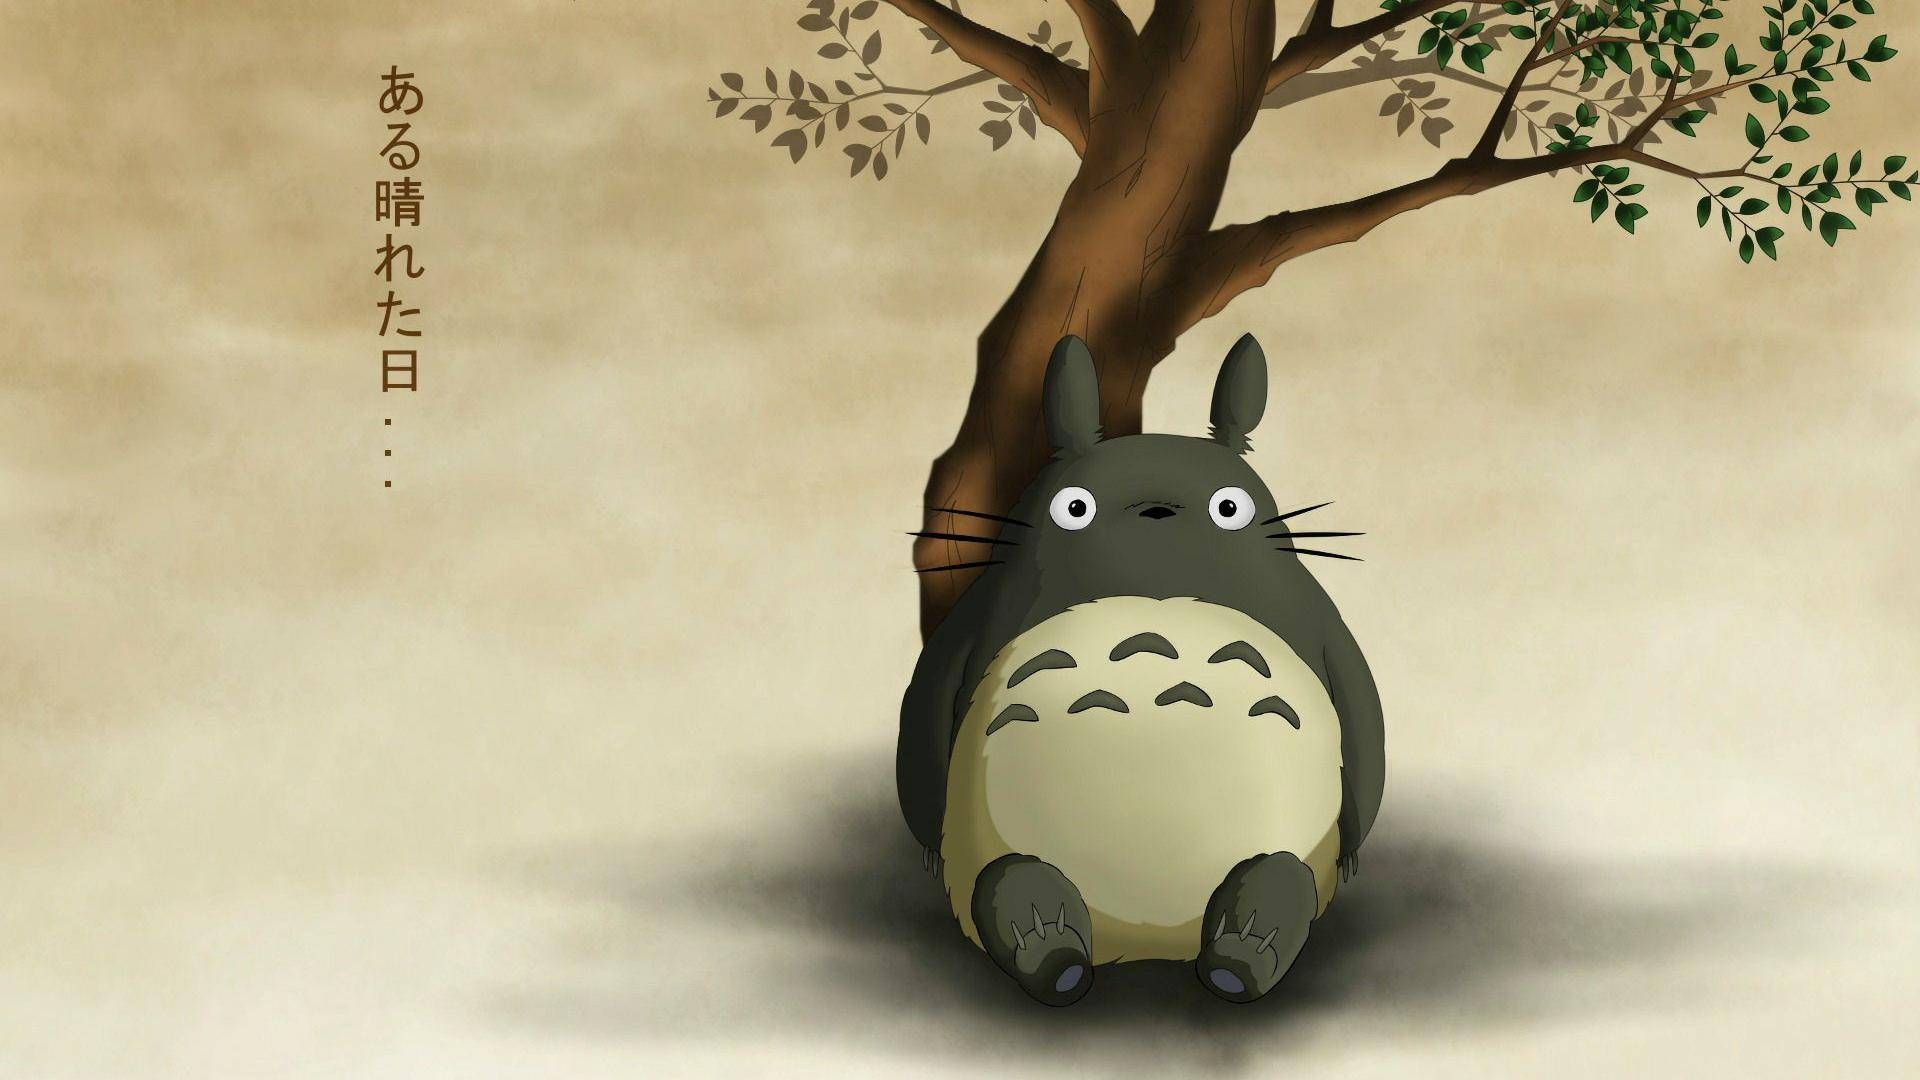 Pin By Mgrockets On Totoro My Neighbor Totoro Totoro Studio Ghibli